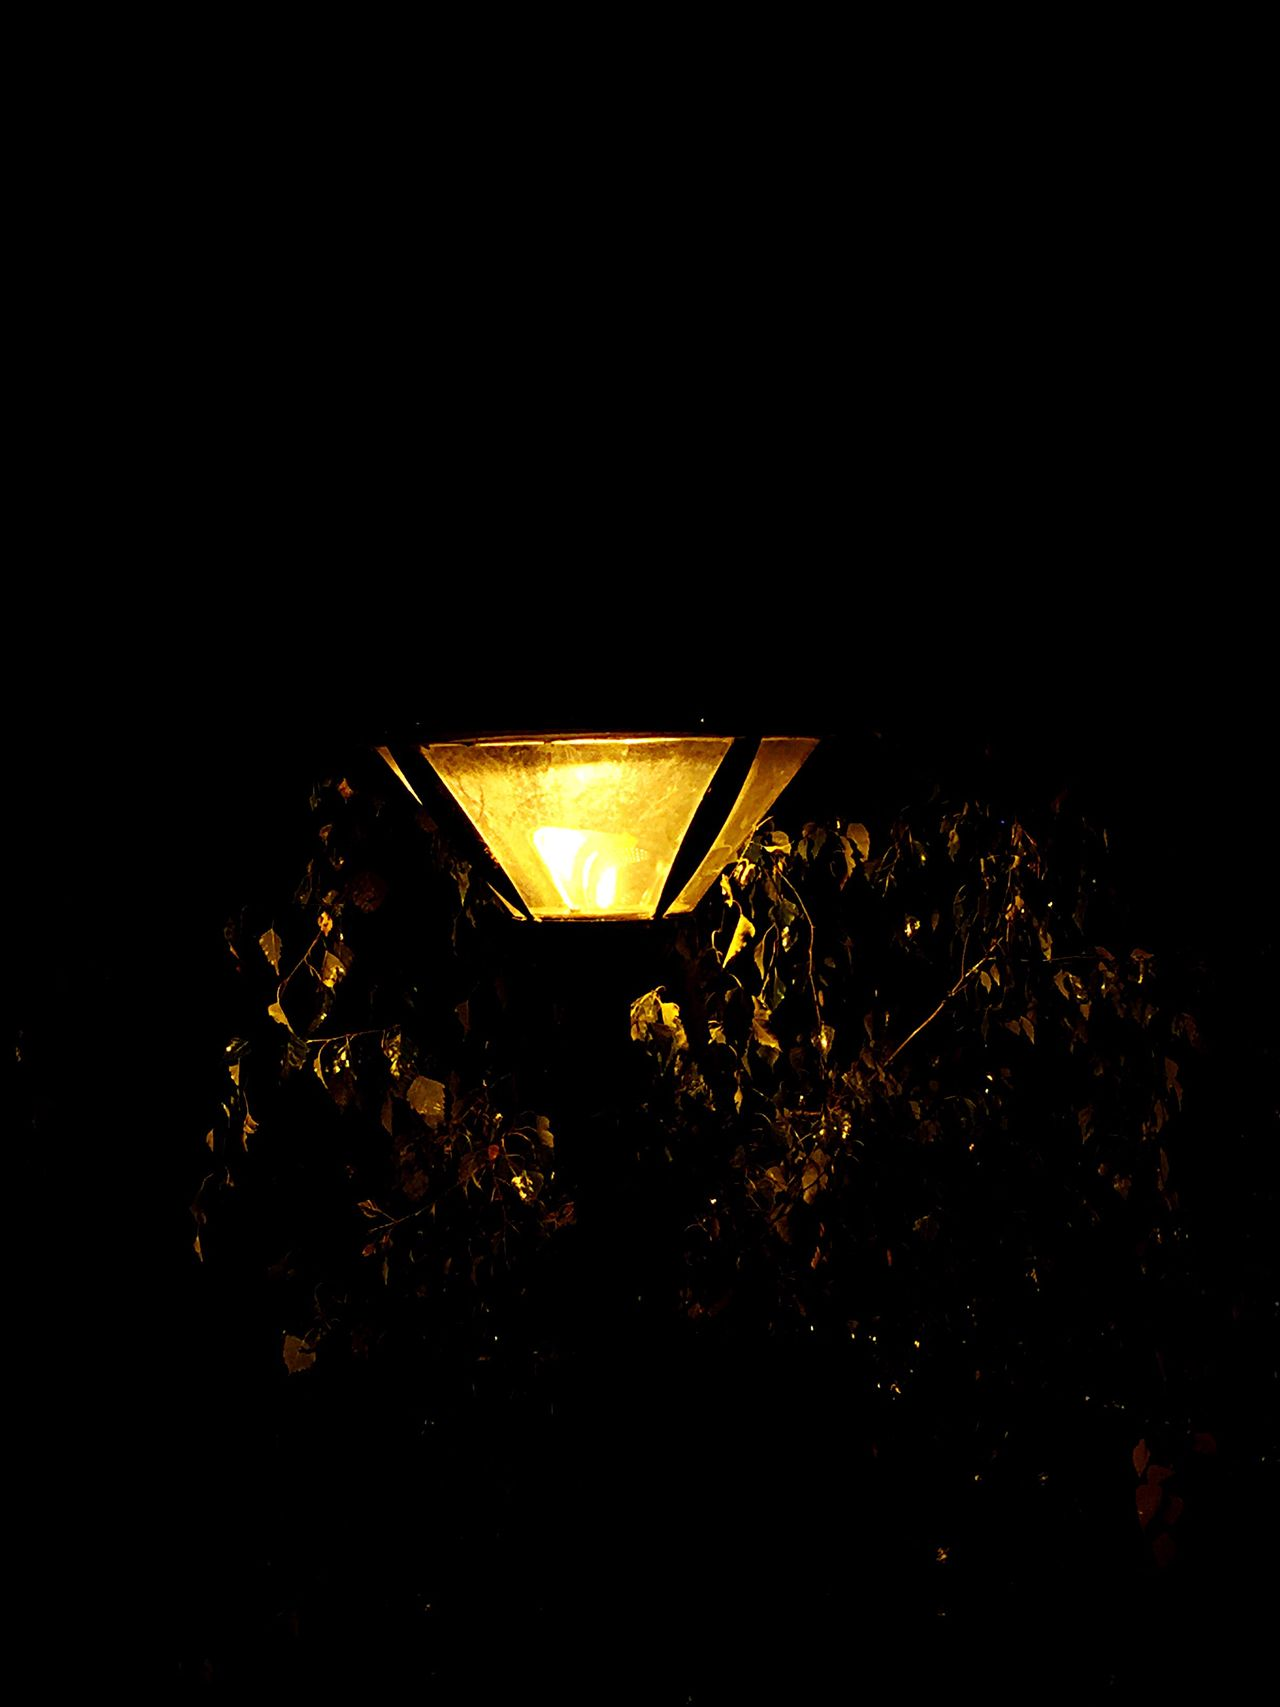 No People Illuminated Lighting Equipment Indoors  Nature Night Close-up